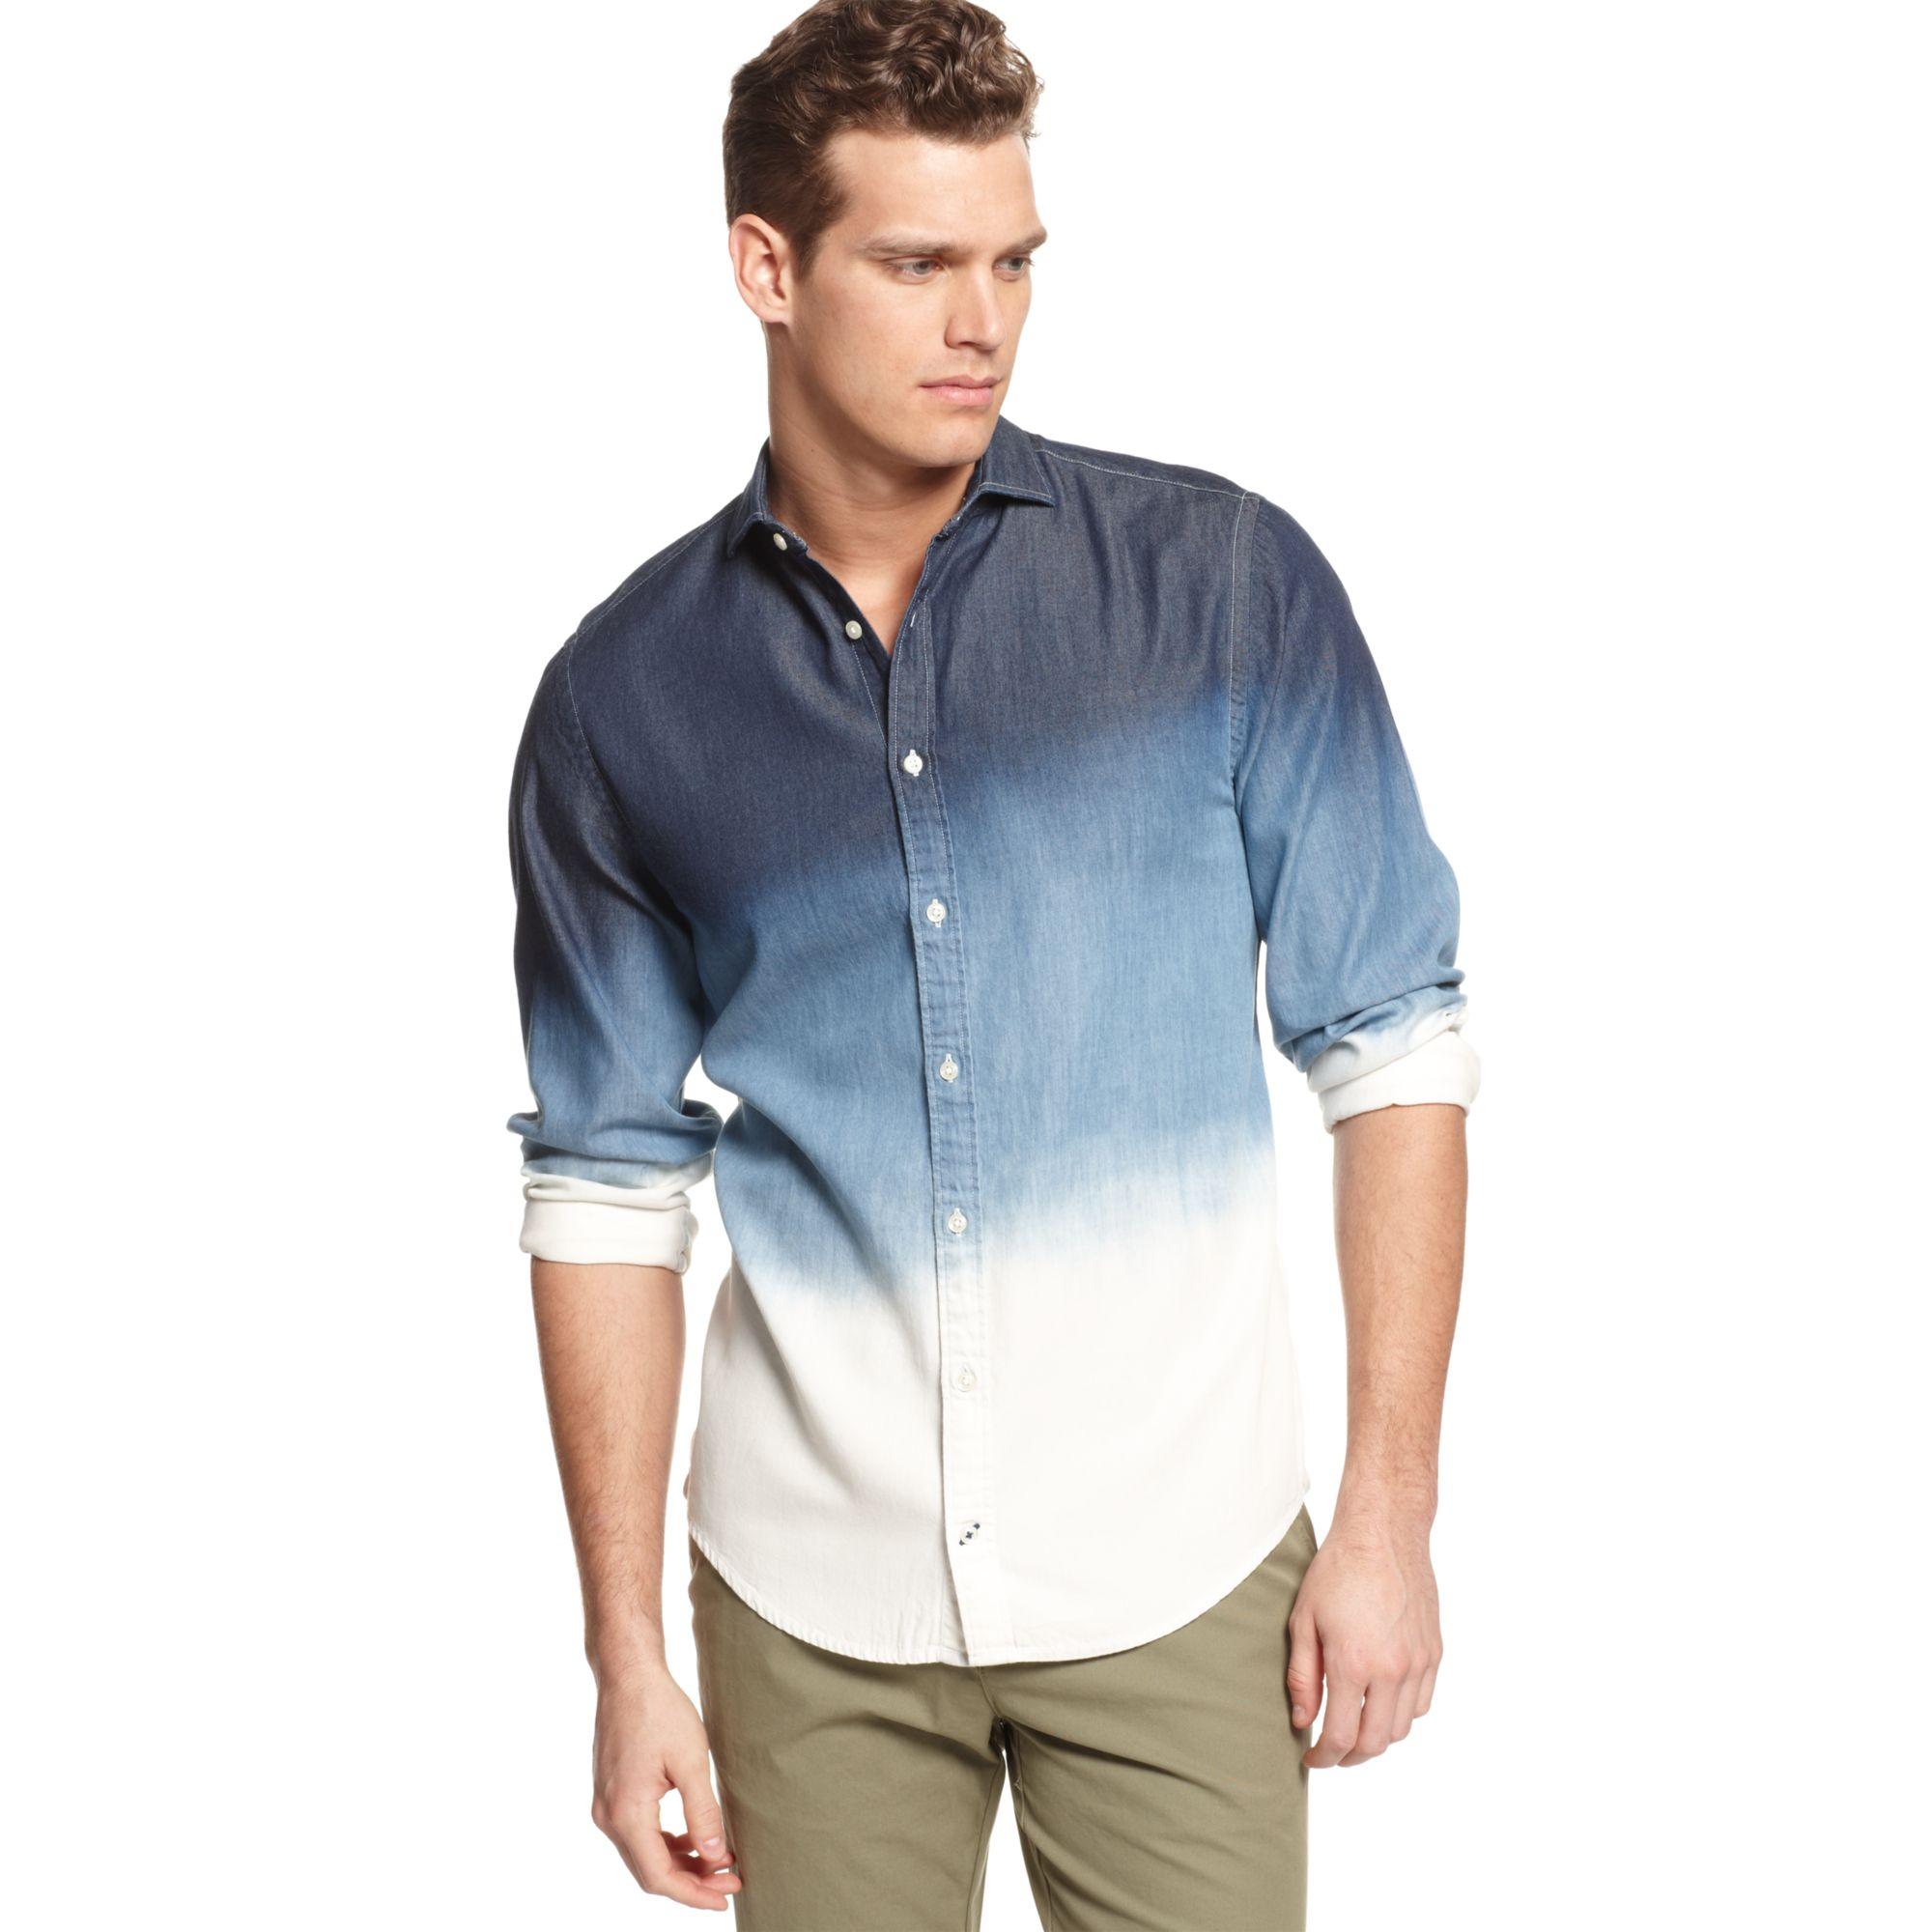 Tommy Hilfiger Dipdye Denim Shirt European Collection In